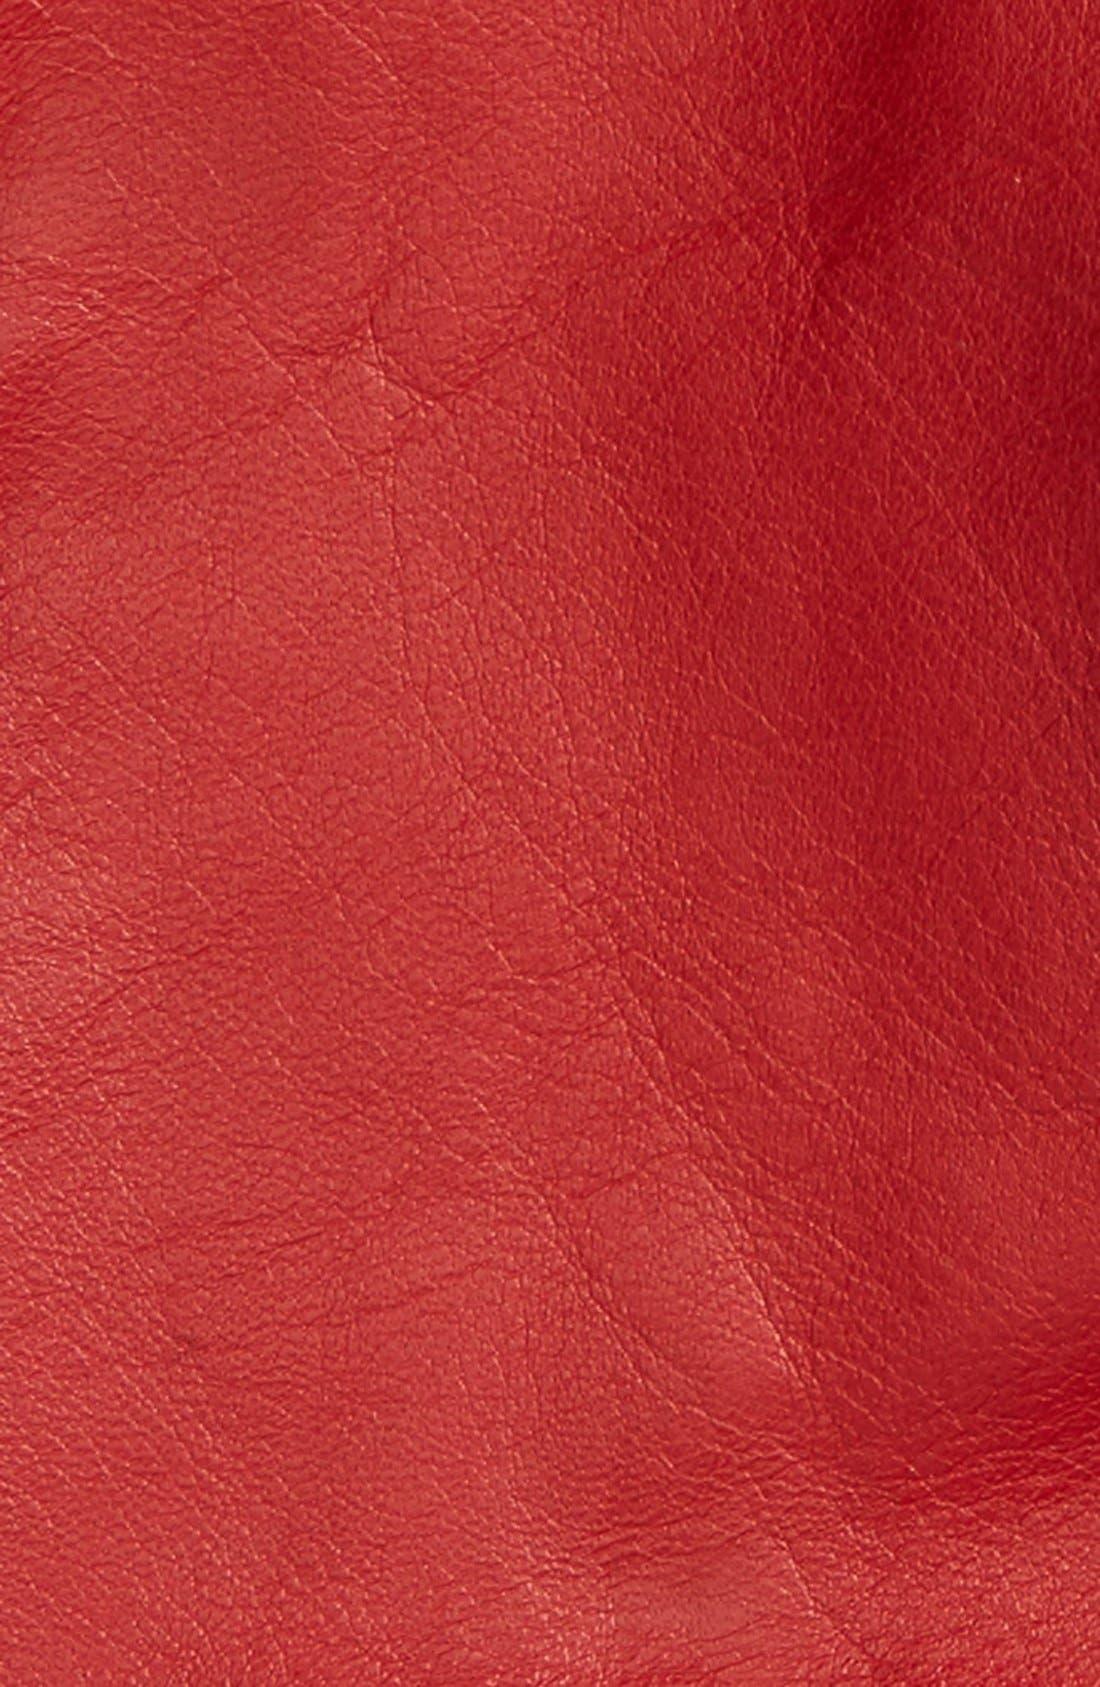 Short Leather Gloves,                             Alternate thumbnail 11, color,